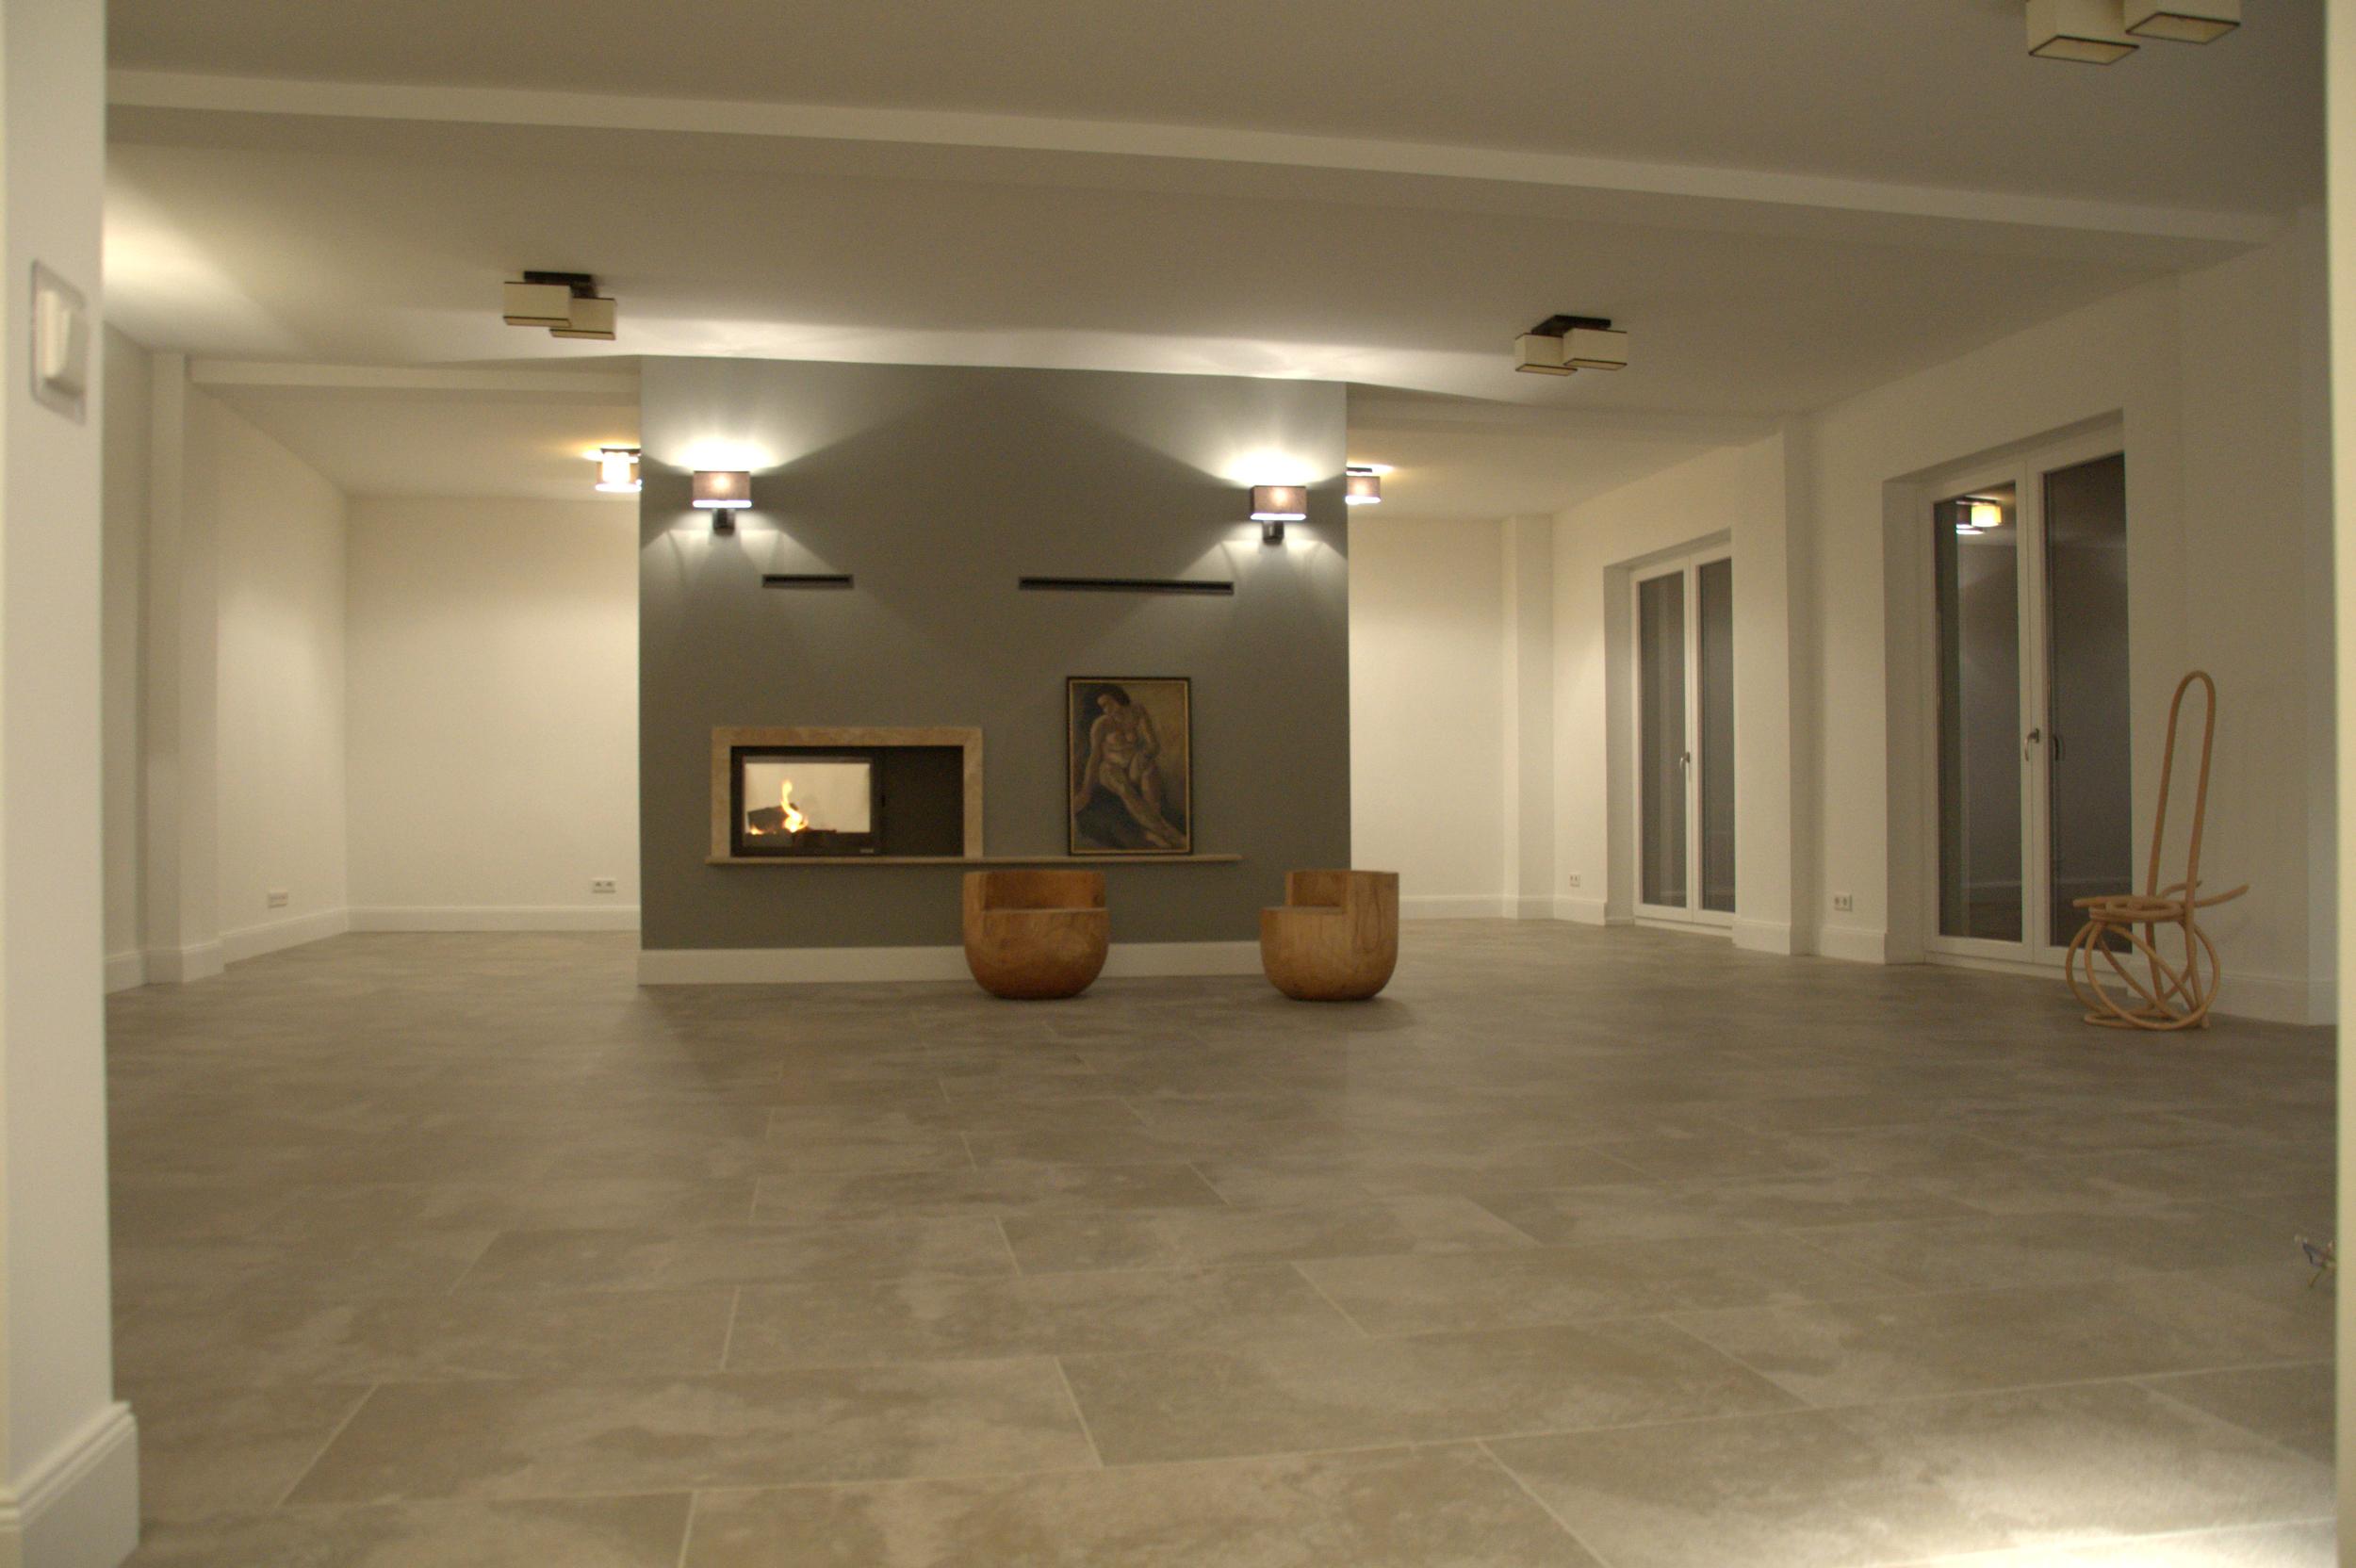 Großzügiger Lebensraum Wohnzummer, Lounge, offene Küche, Kamin